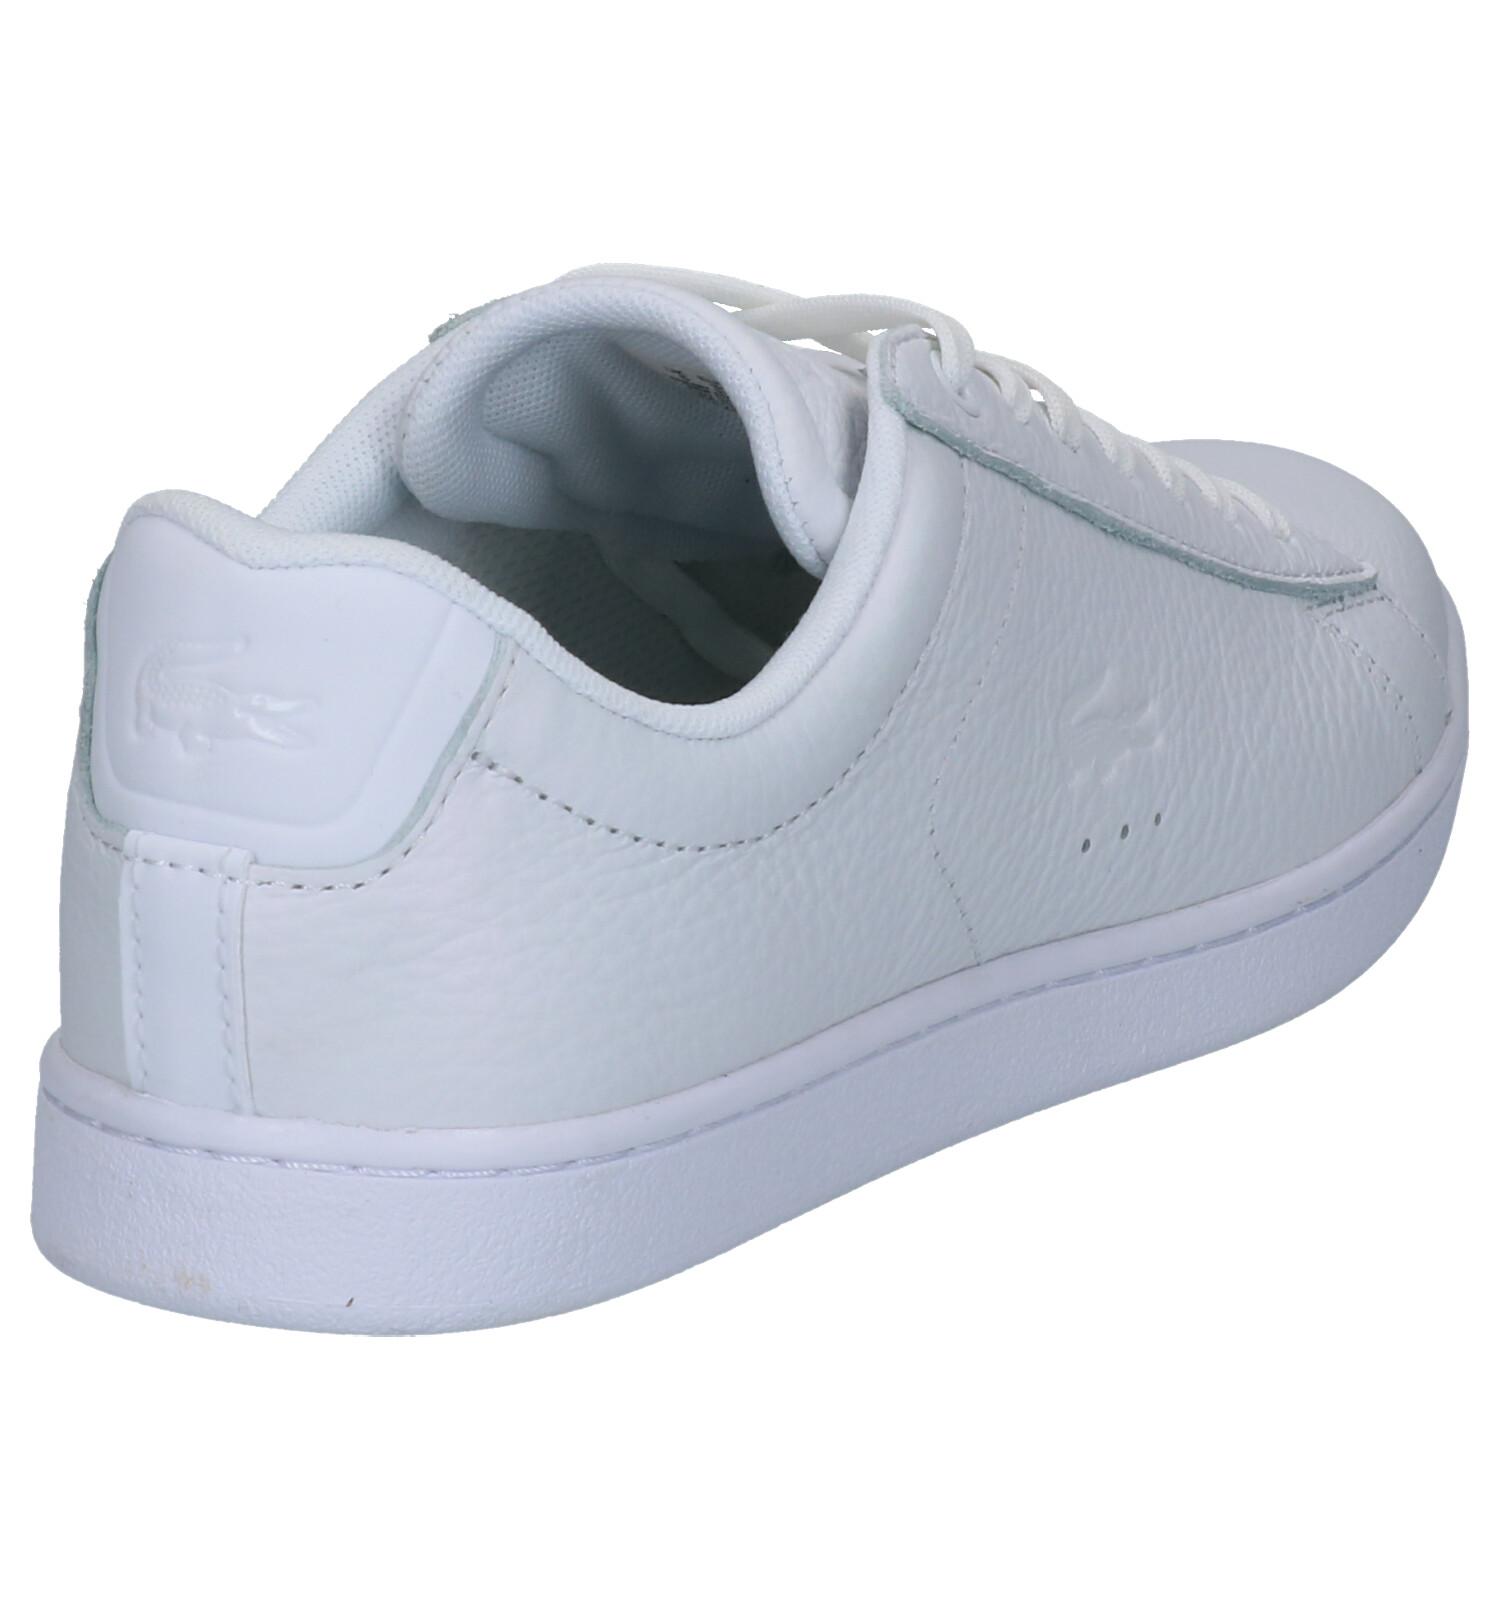 Carnaby Carnaby Witte Sneakers Evo Evo Carnaby Lacoste Lacoste Sneakers Lacoste Evo Witte Witte vwm0yN8nOP